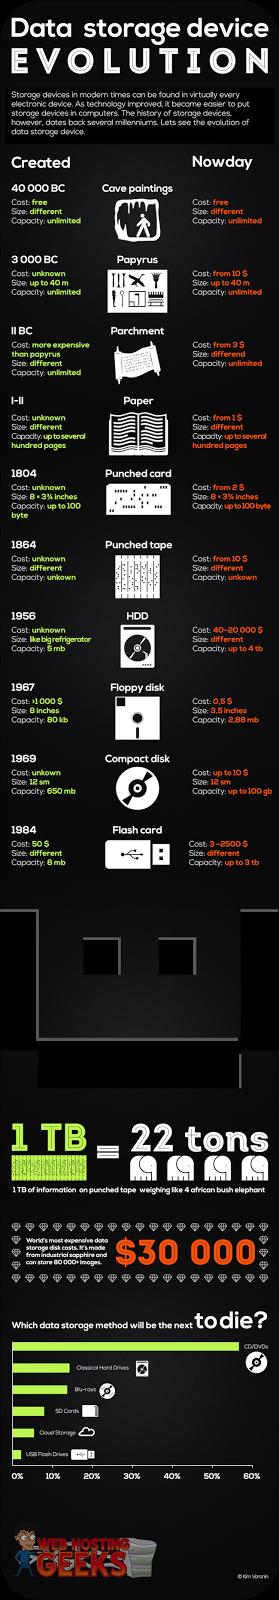 Data Storage Device Evolution